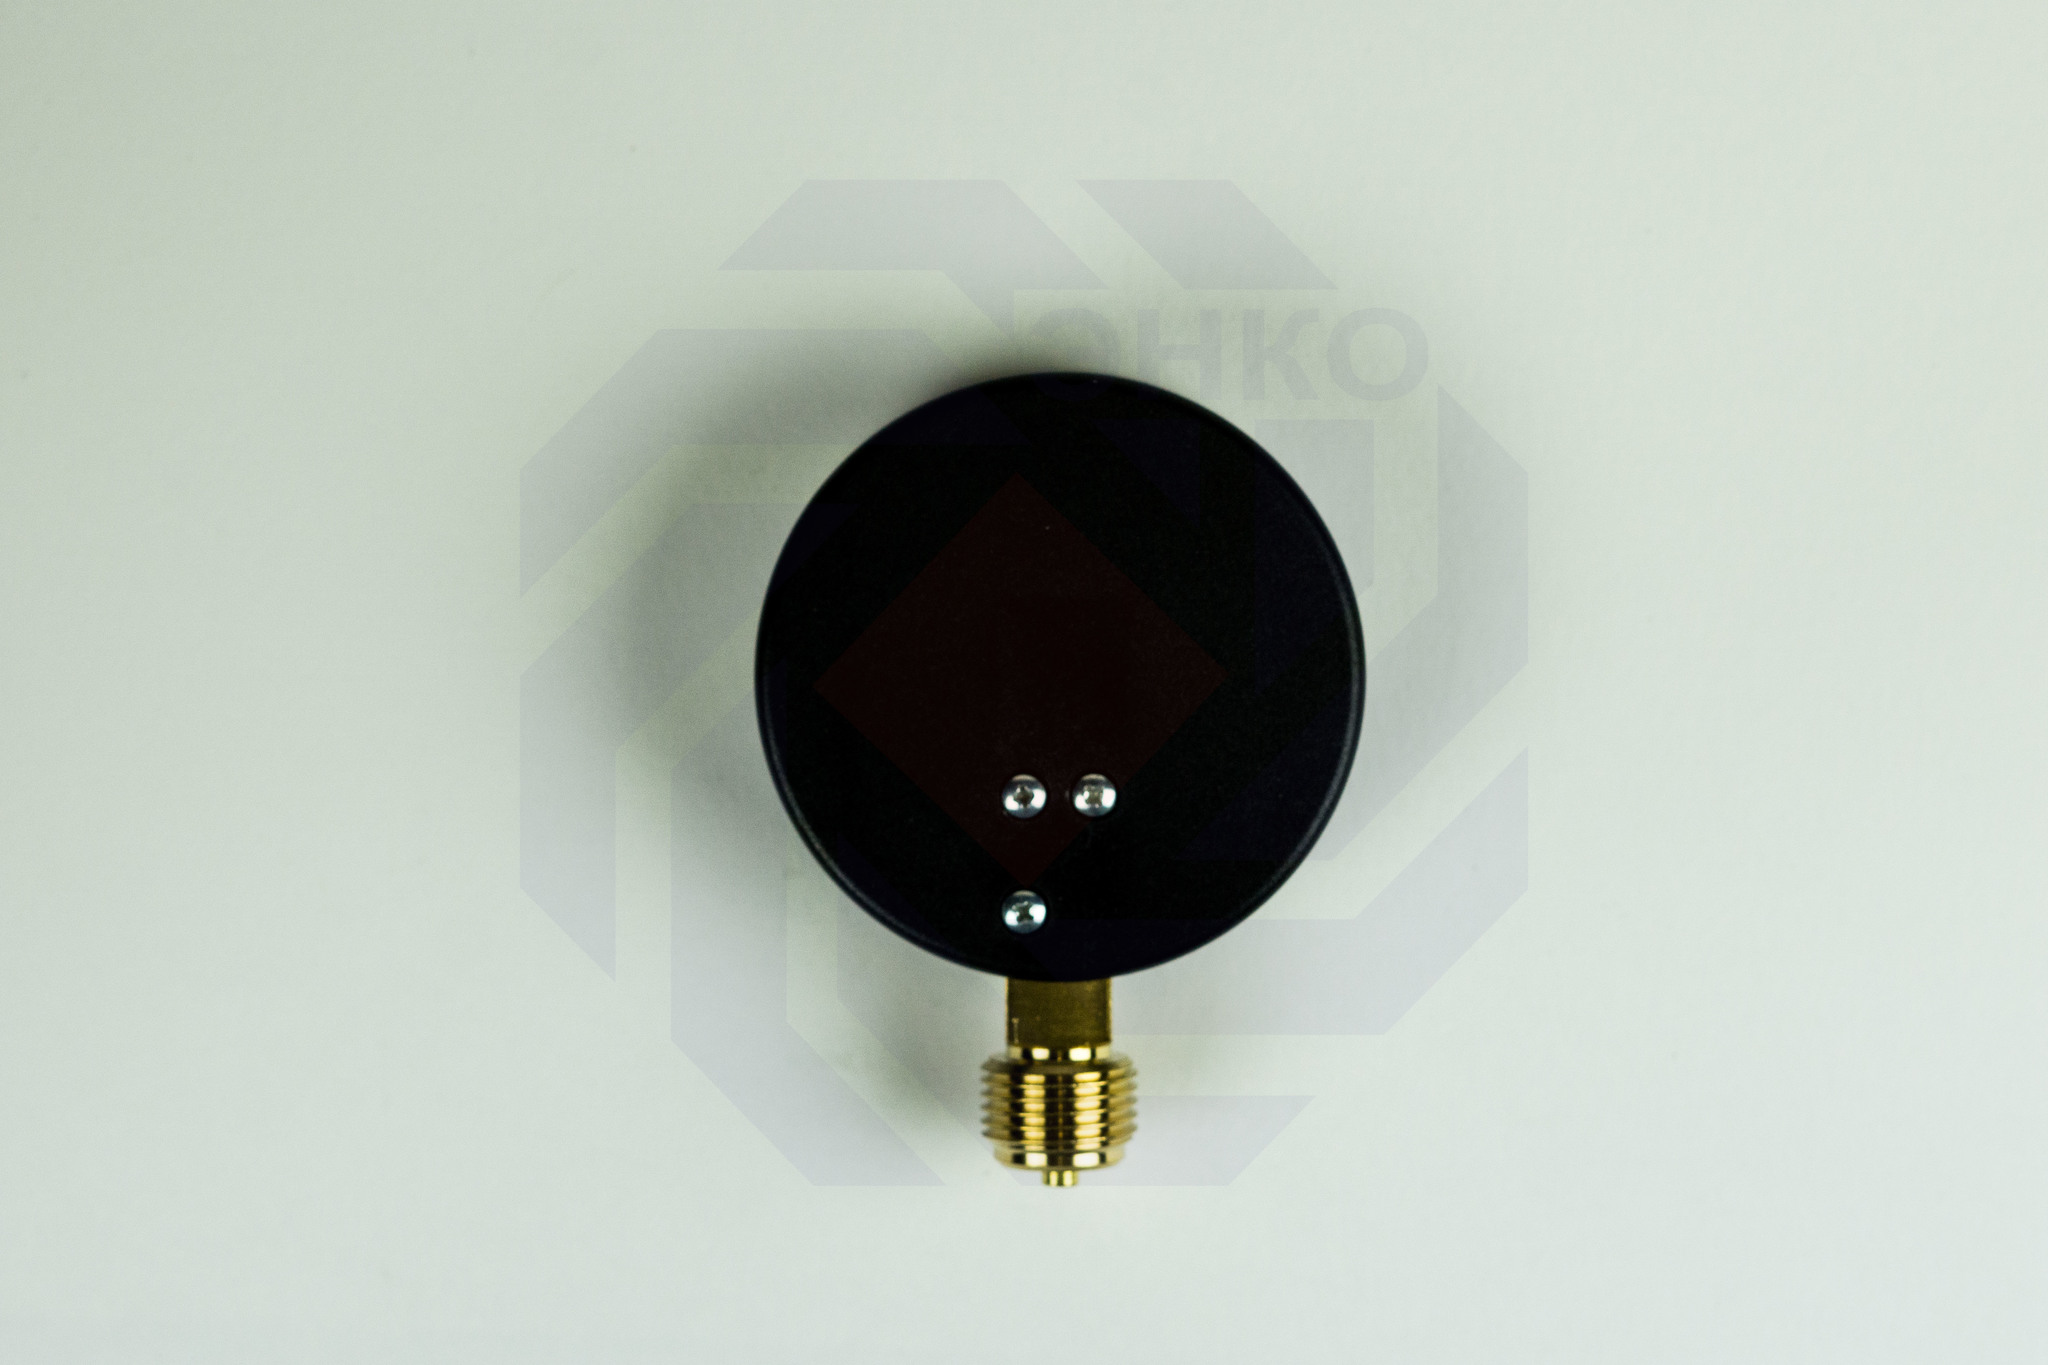 Манометр радиальный WATTS MDR 80/10 (F+R200) 0-10 бар 80 мм ½